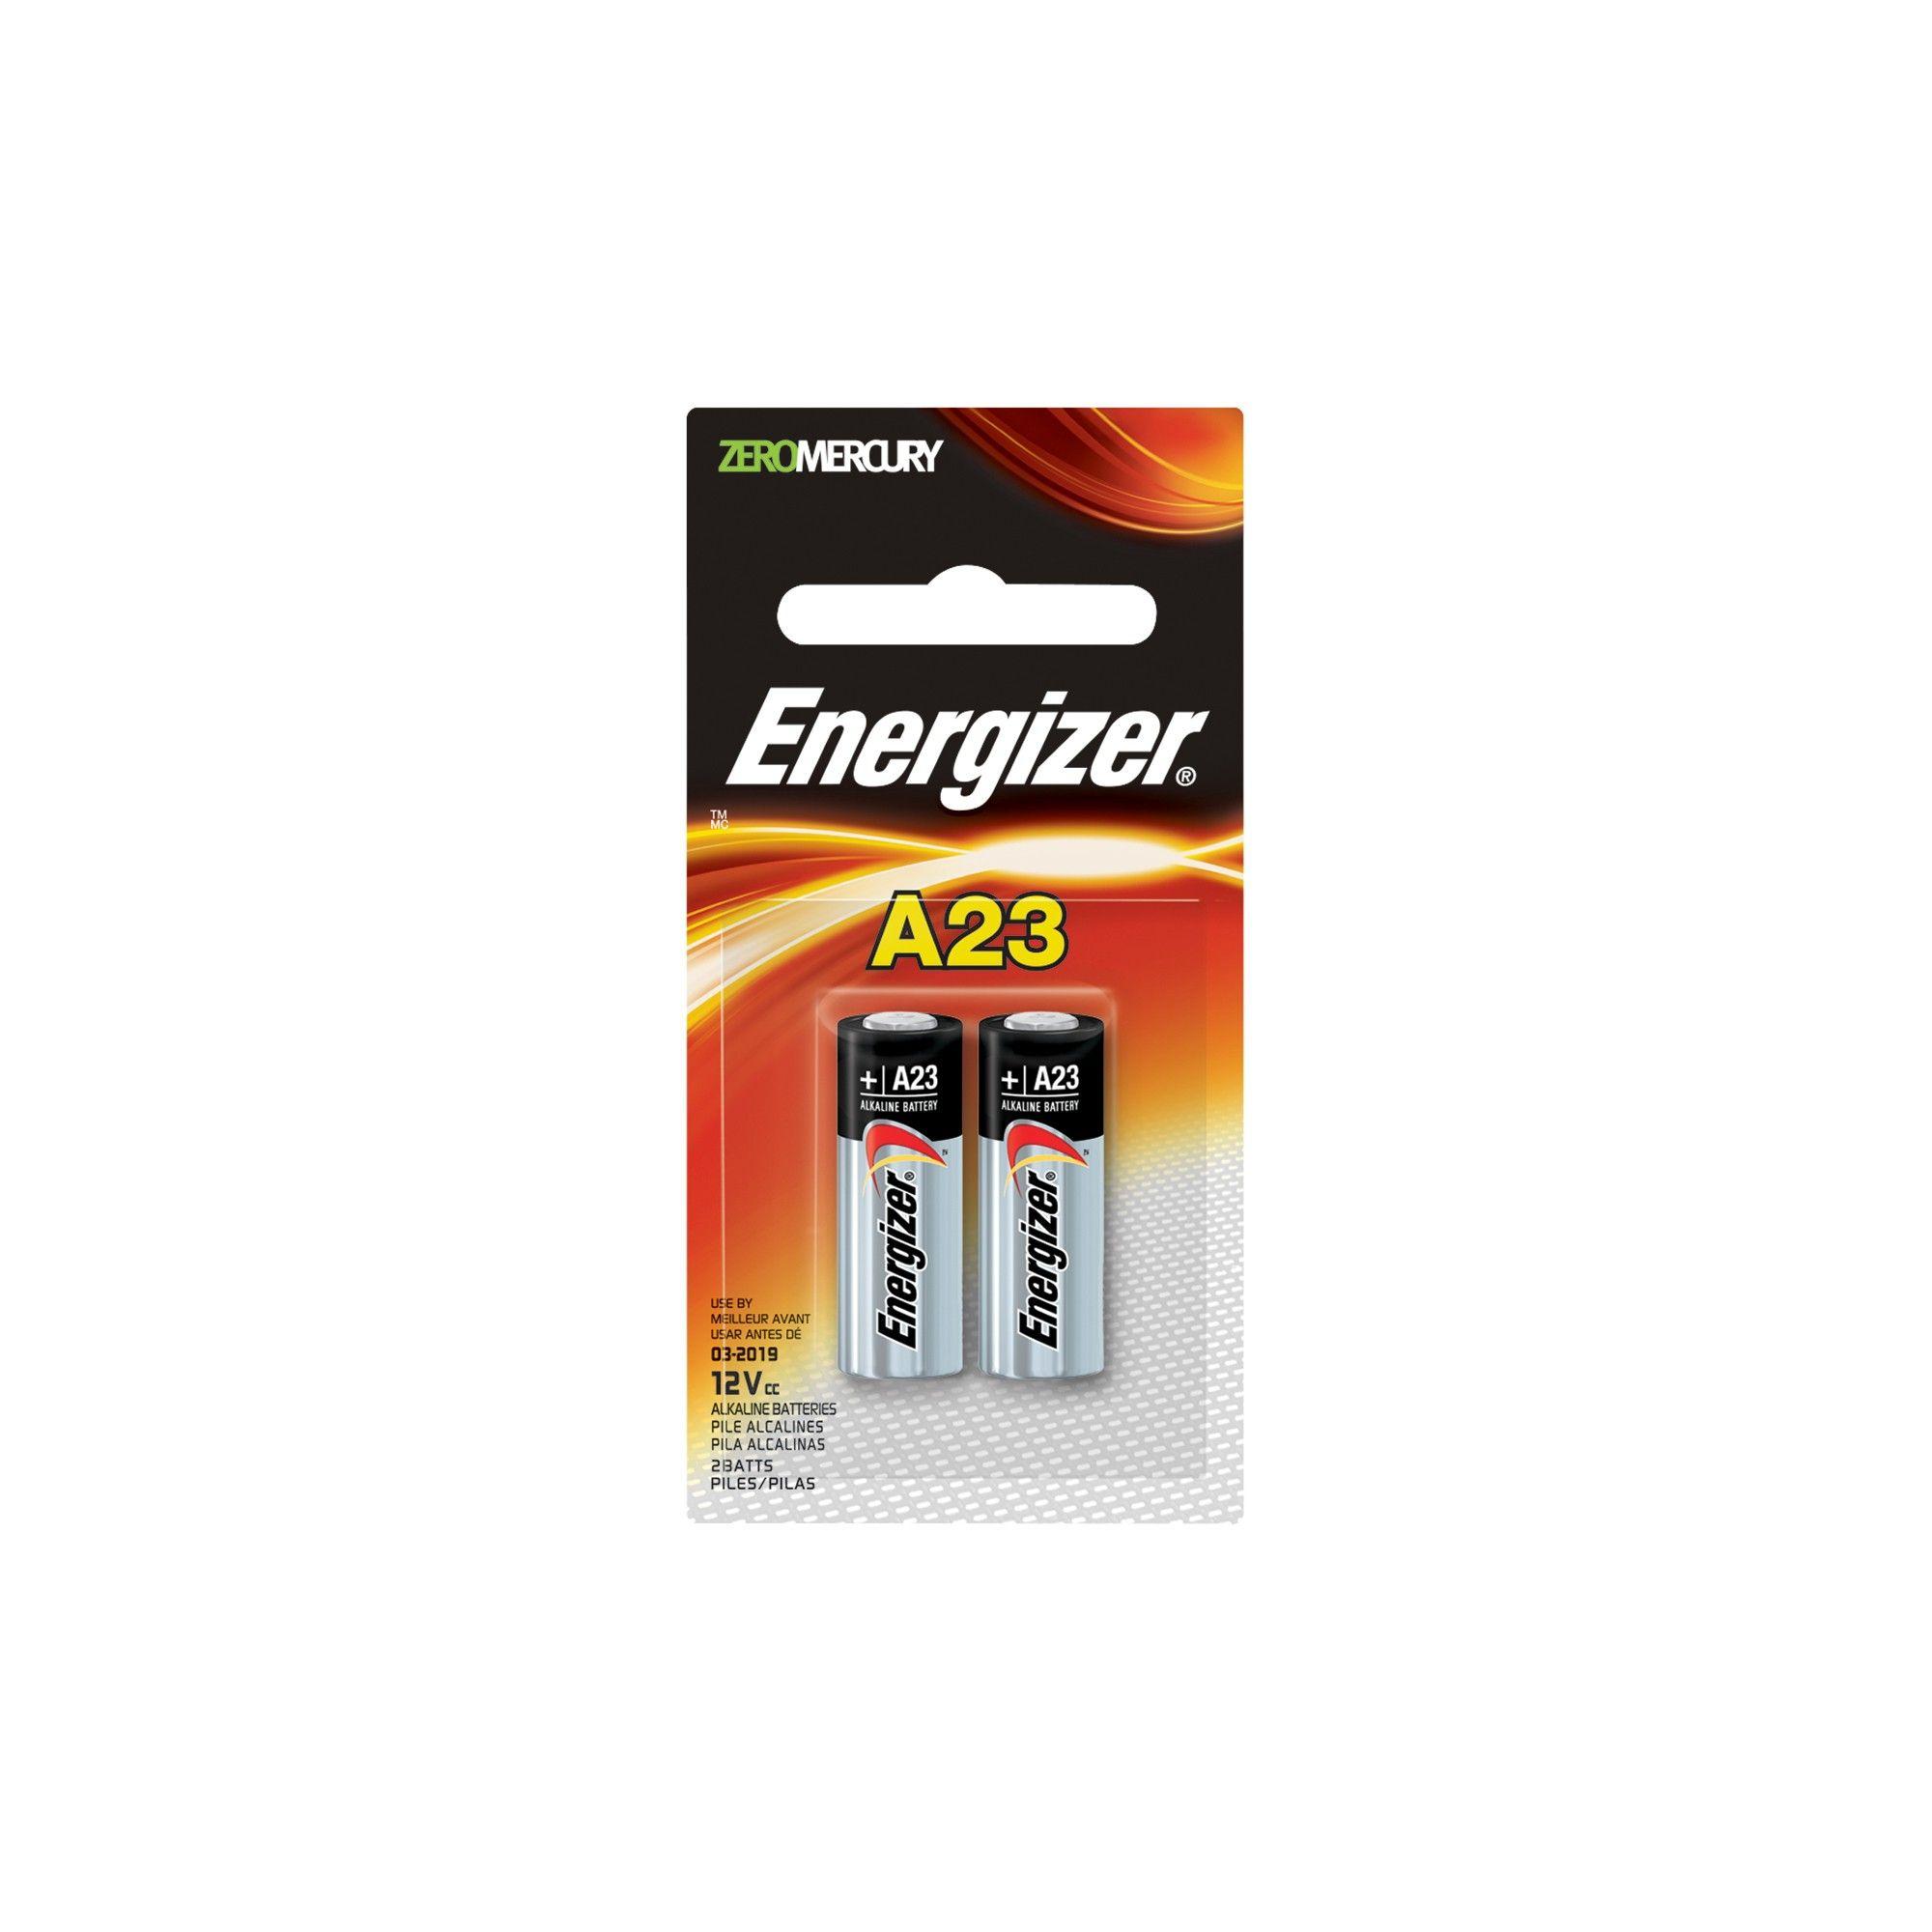 Energizer 2pk A23 Batteries Energizer Battery A23 Battery Energizer